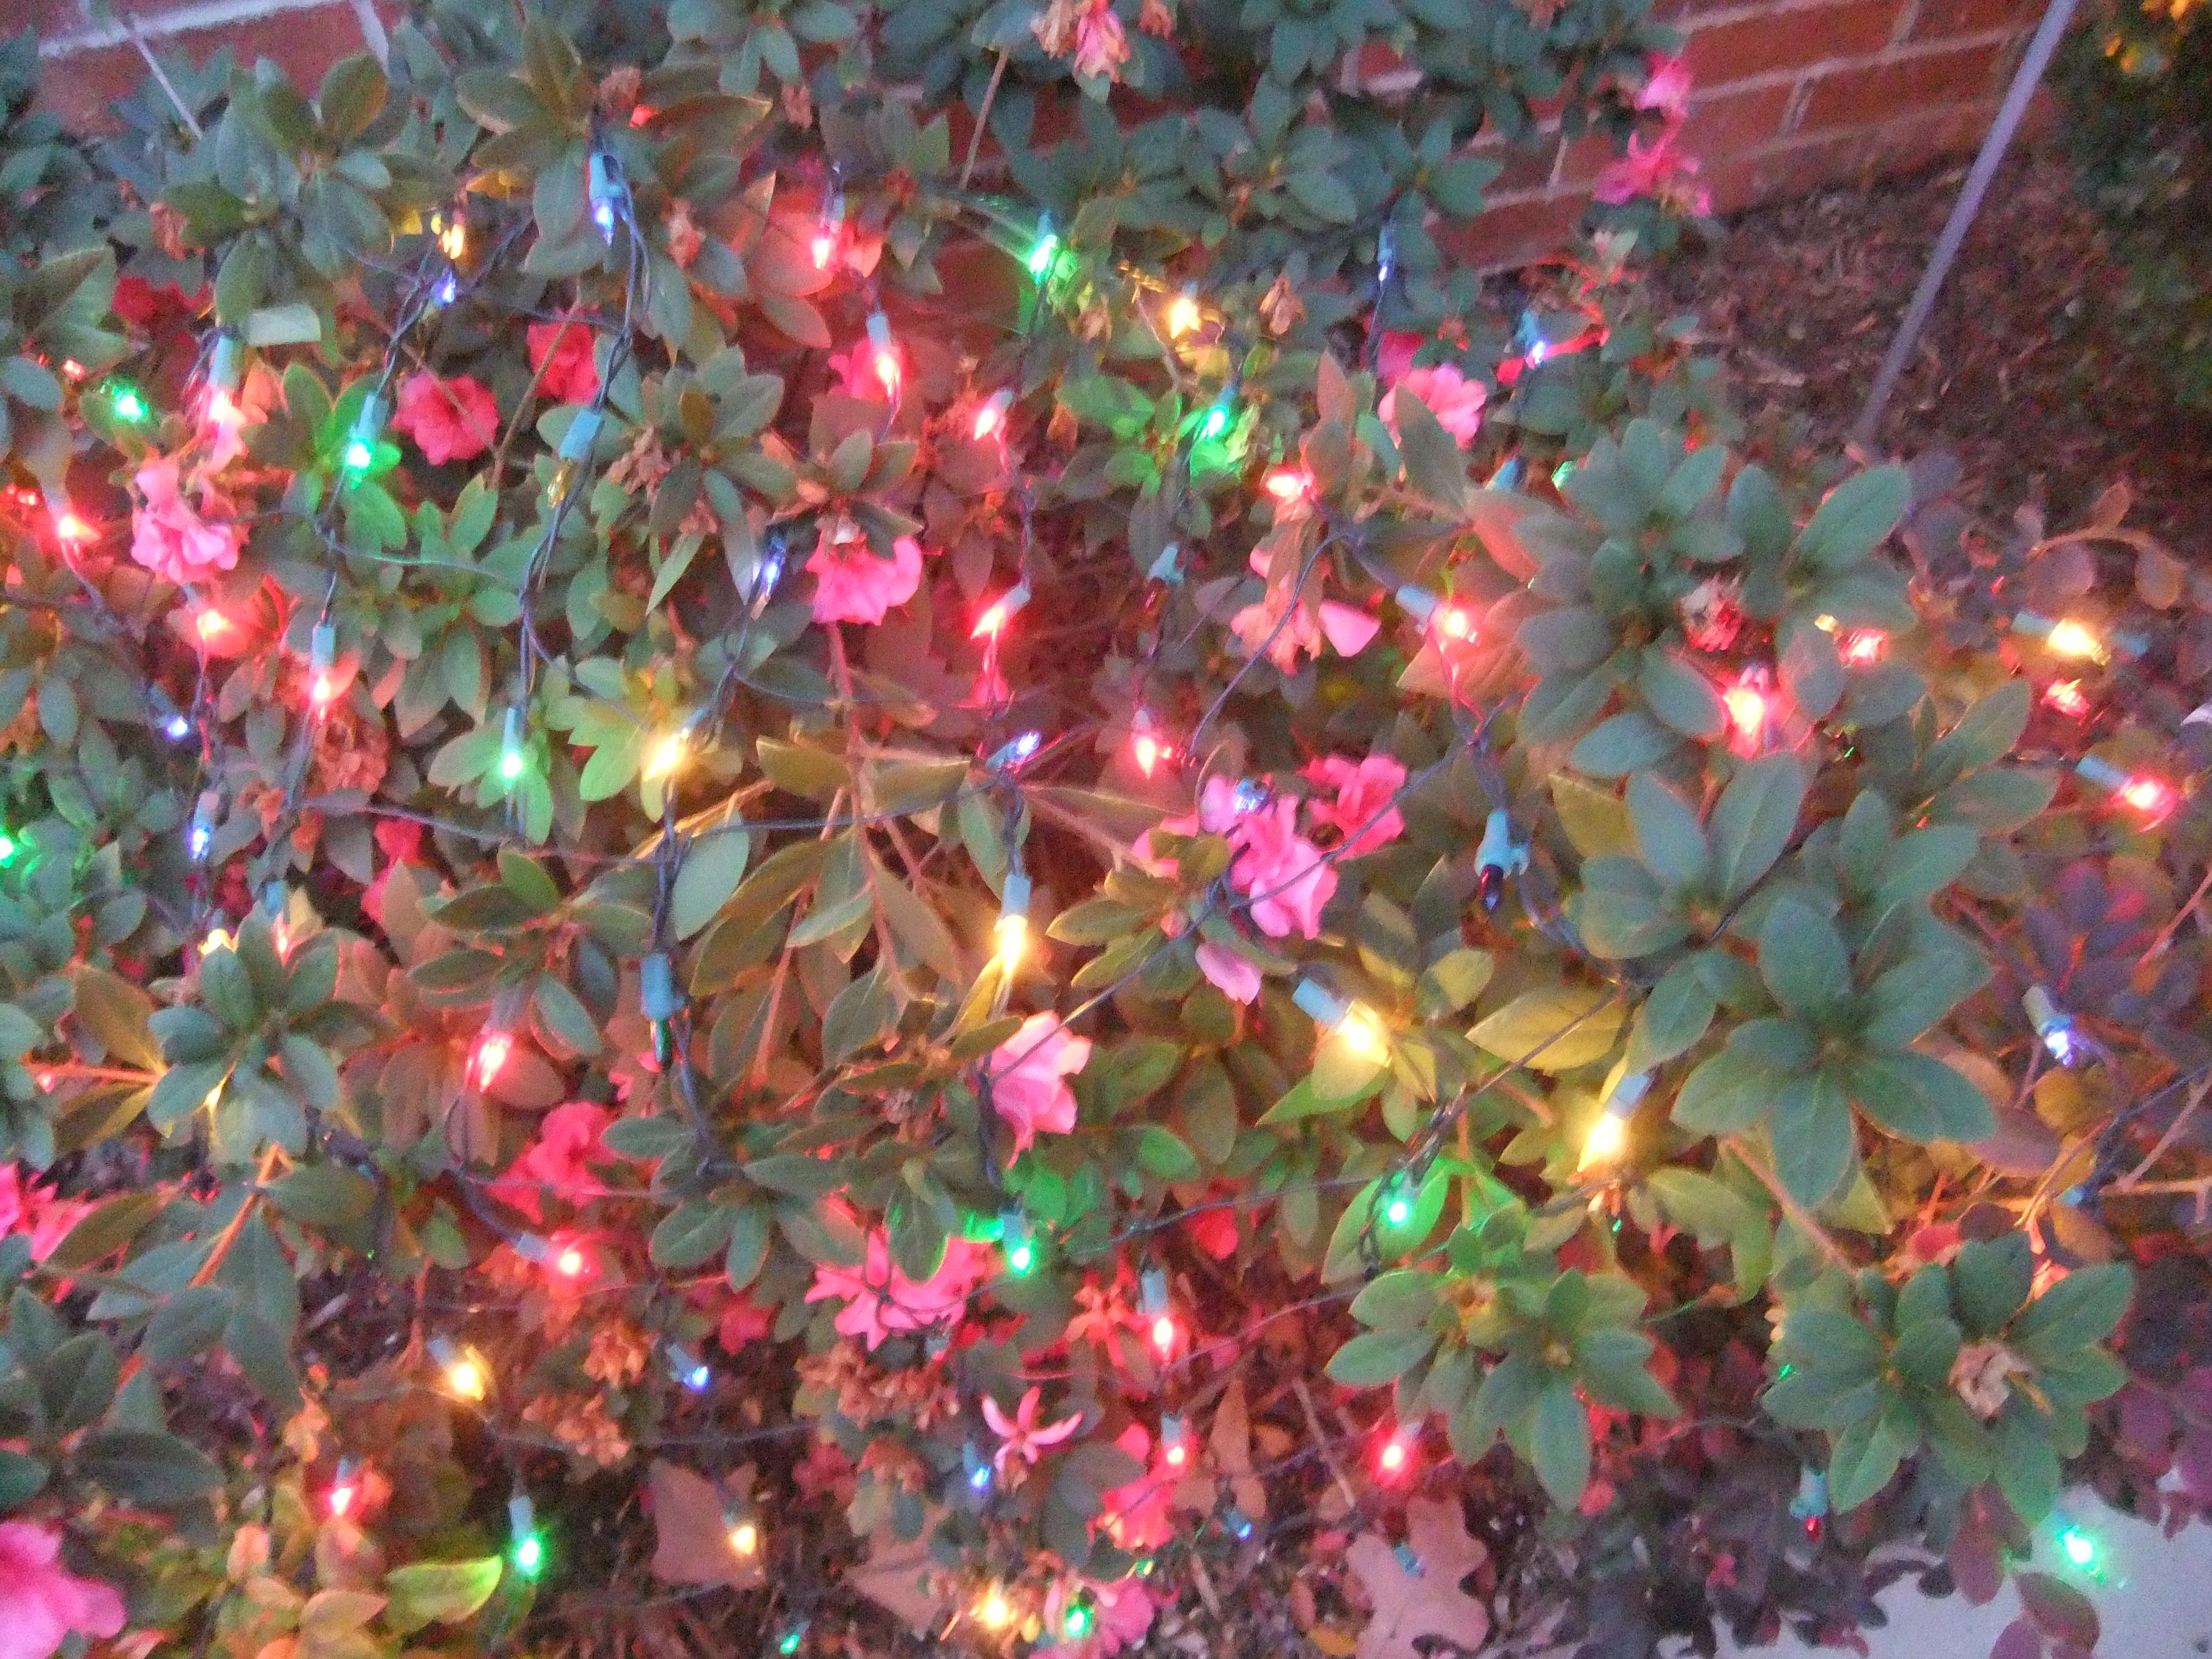 Blinking Christmas Lights Wallpaper Christmas lights on bushes 3616x2712